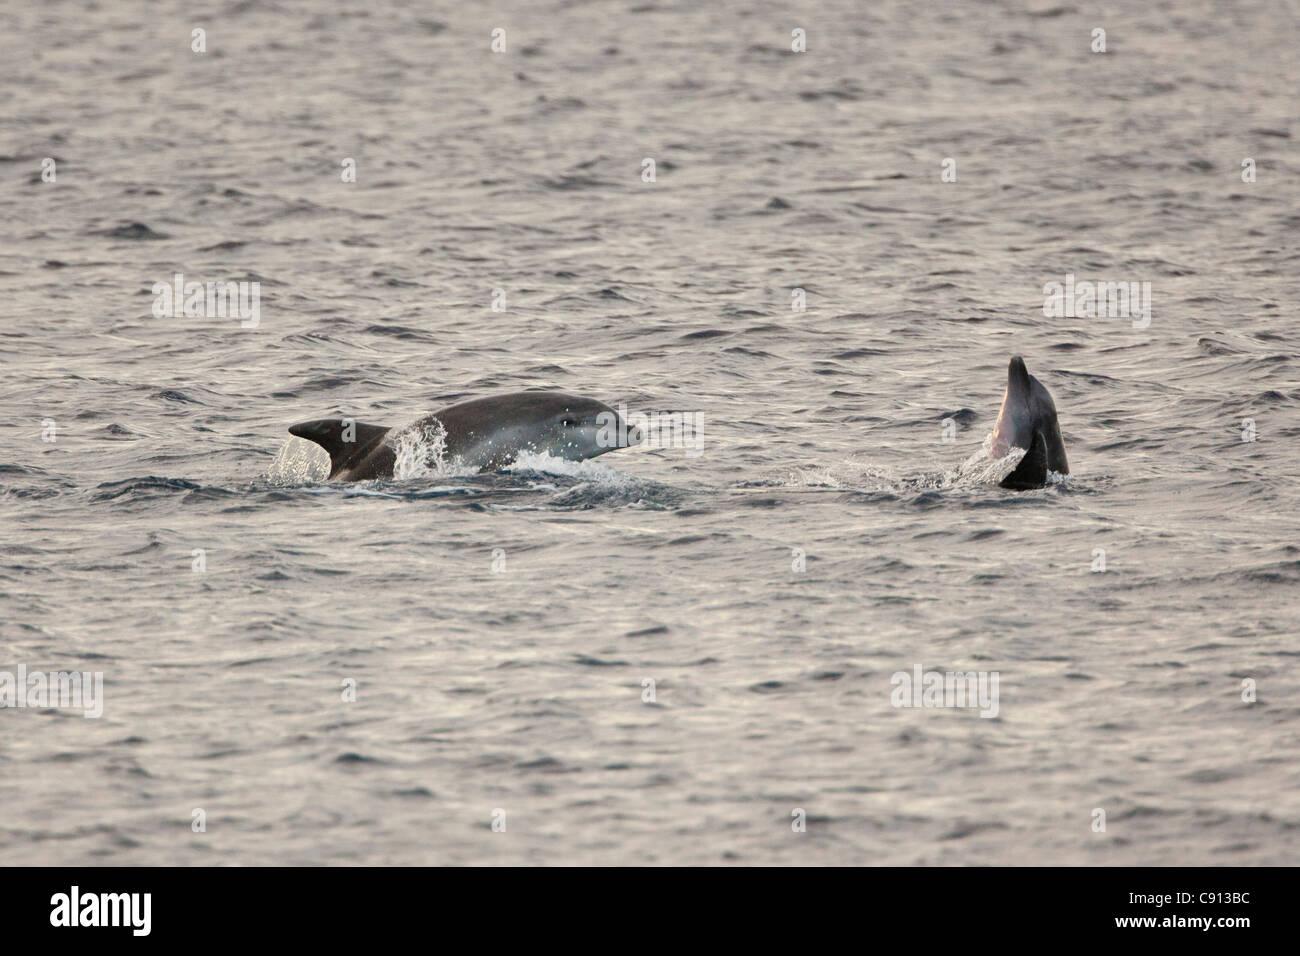 The Netherlands, Bonaire Island, Dutch Caribbean, Kralendijk, Dolphins. - Stock Image